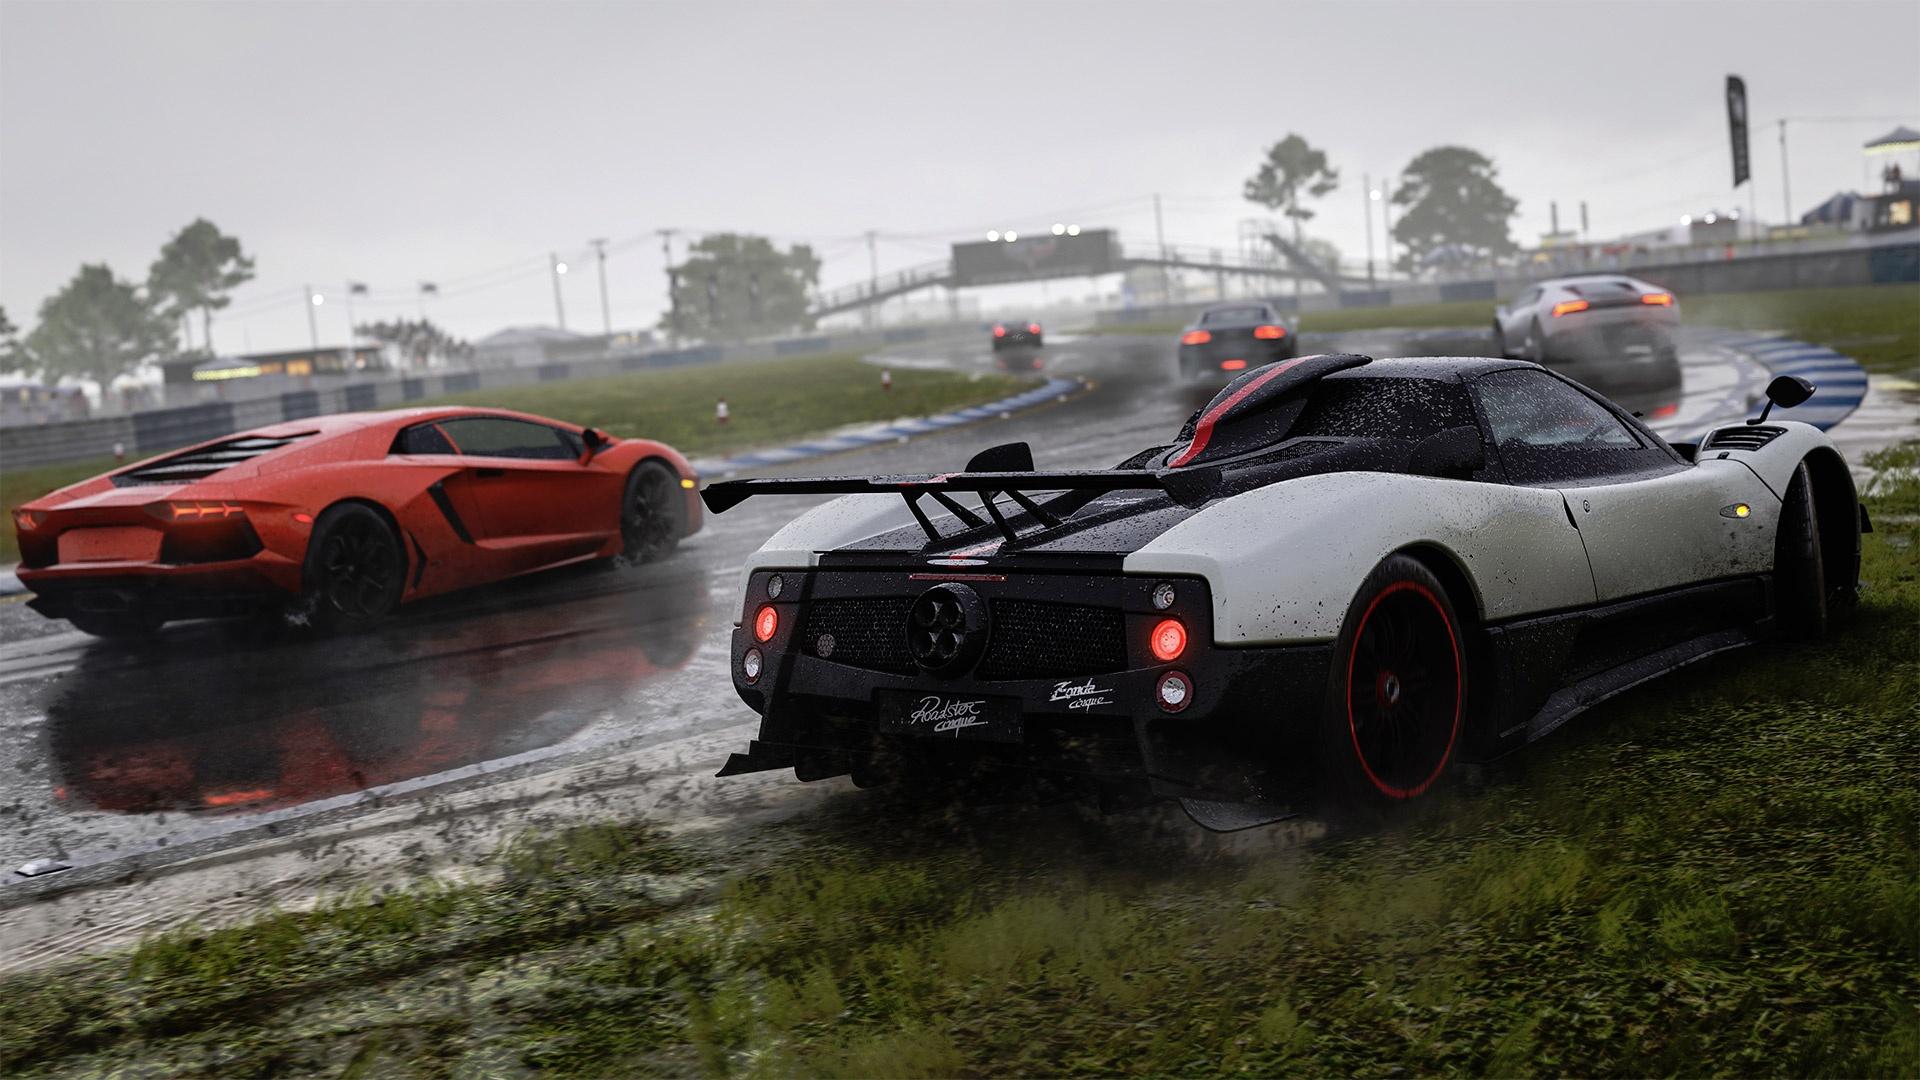 Slideshow Forza Motorsport 6 HD wallpapers IGN India 1920x1080